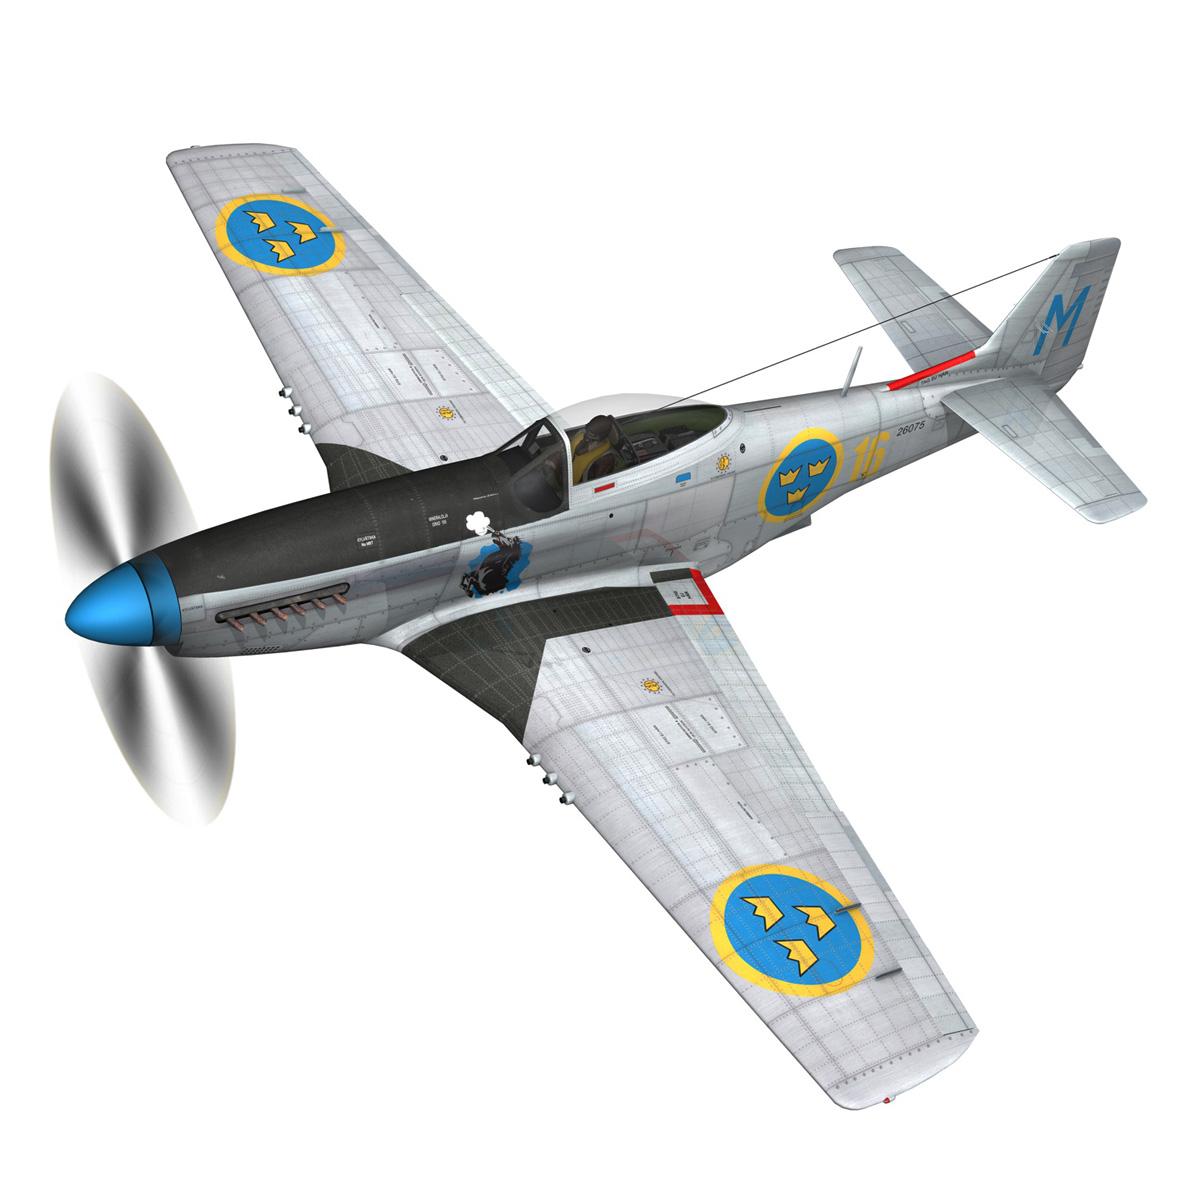 north american p-51d mustang – swedisch airforce 3d model fbx c4d lwo obj 268228